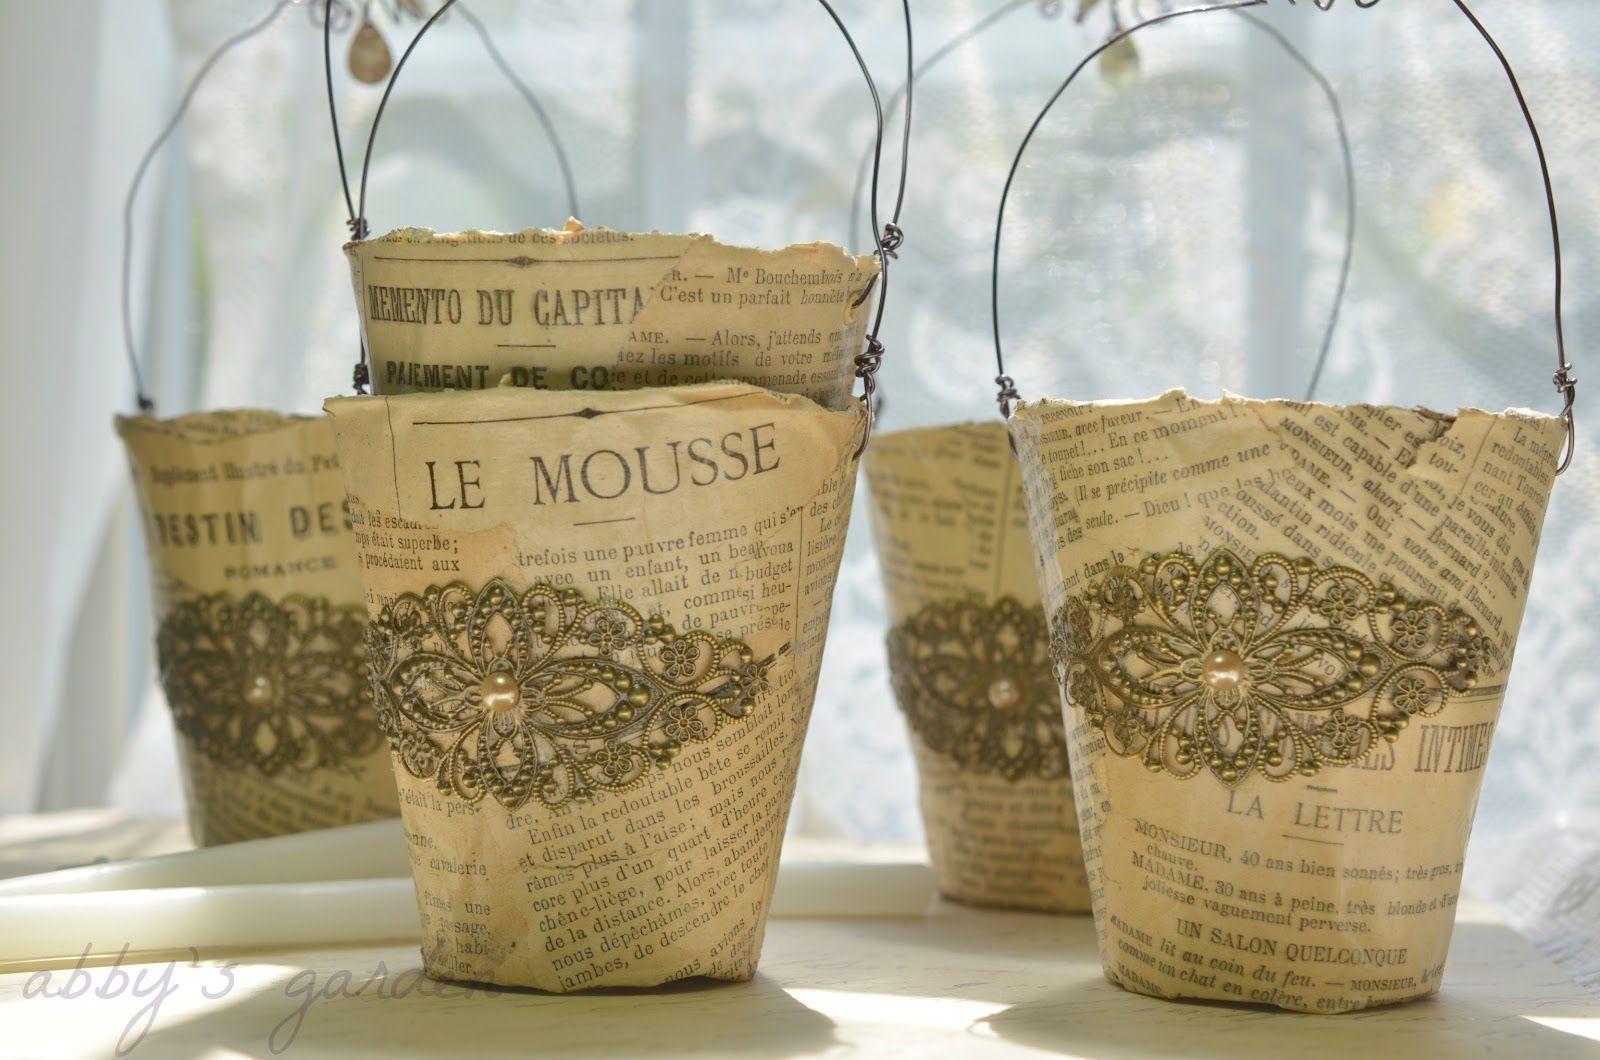 Abby's Paperie Garden: a little bit French